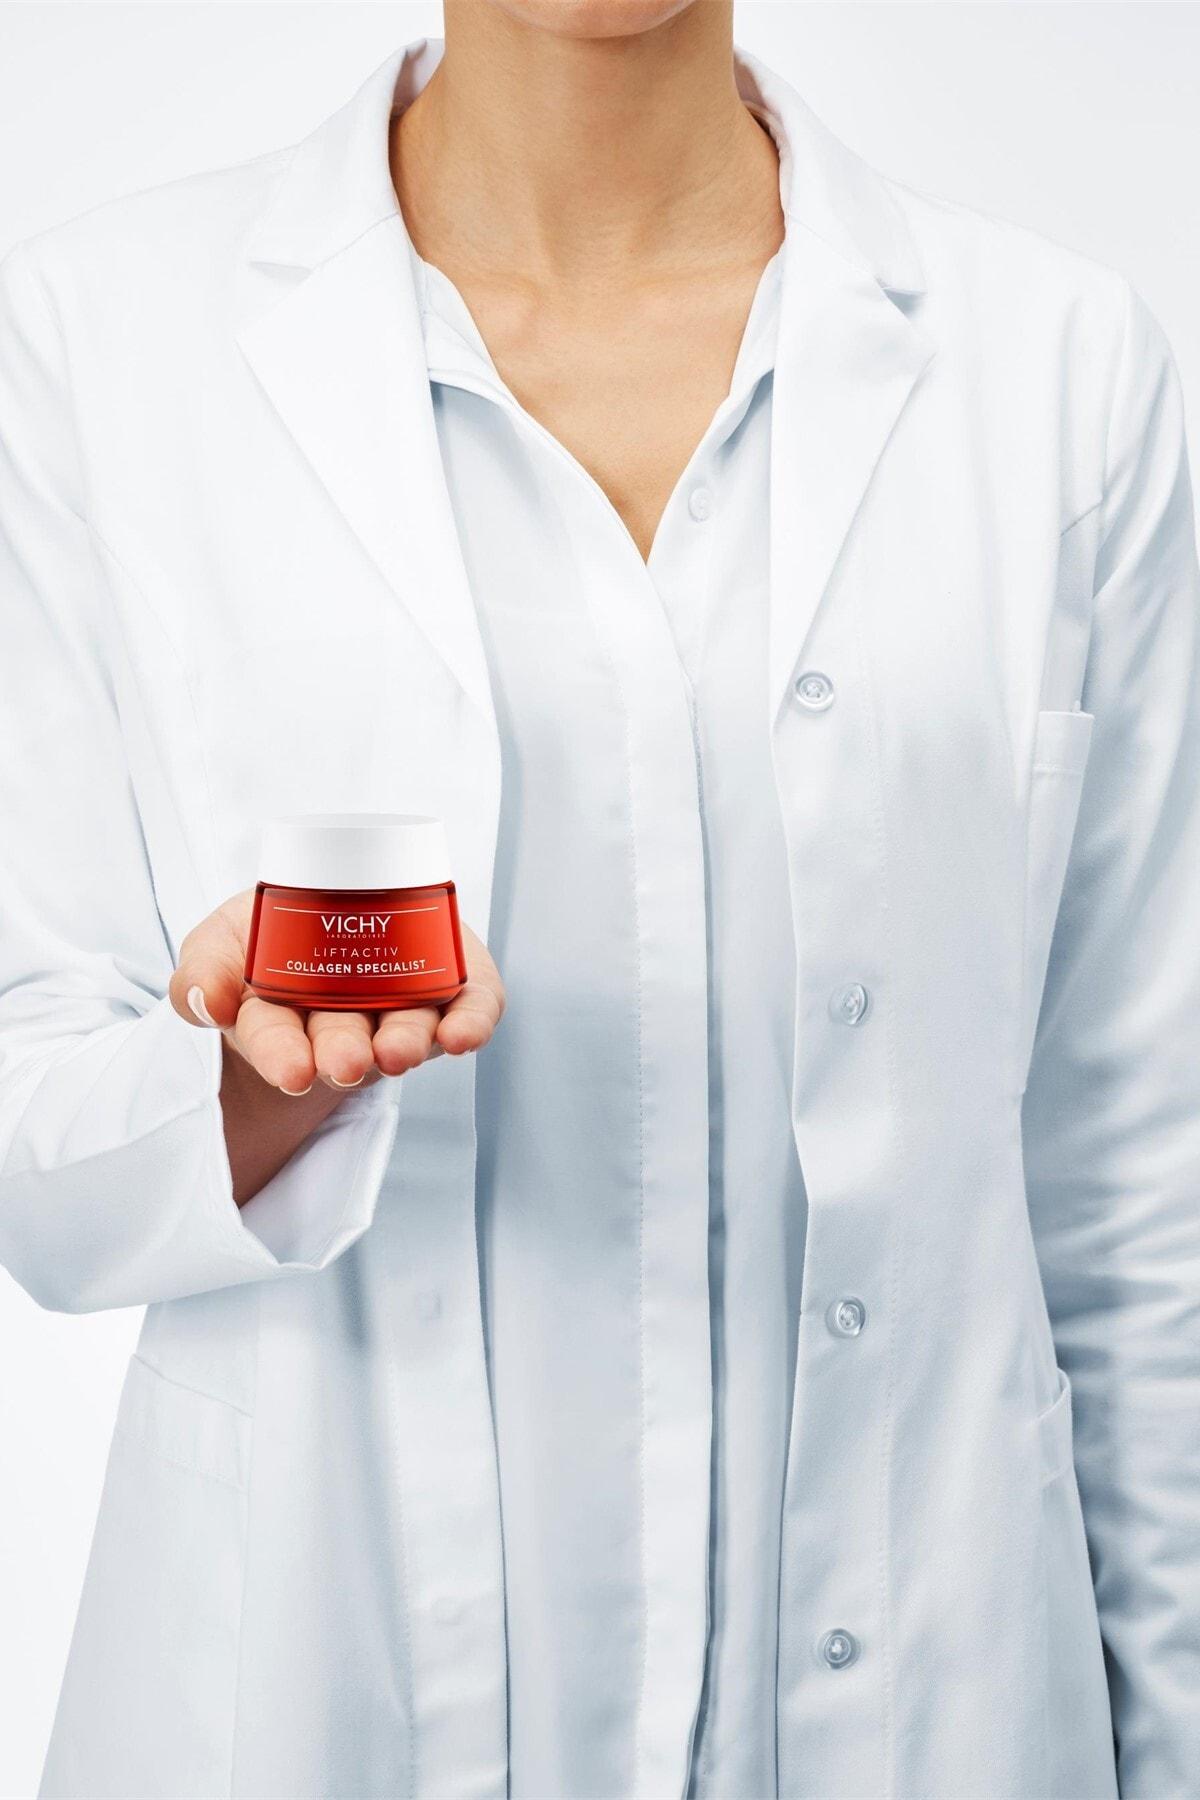 Vichy Liftactiv Collagen Specialist Yaşlanma Karşıtı Krem 50 ml 3337875607254 2